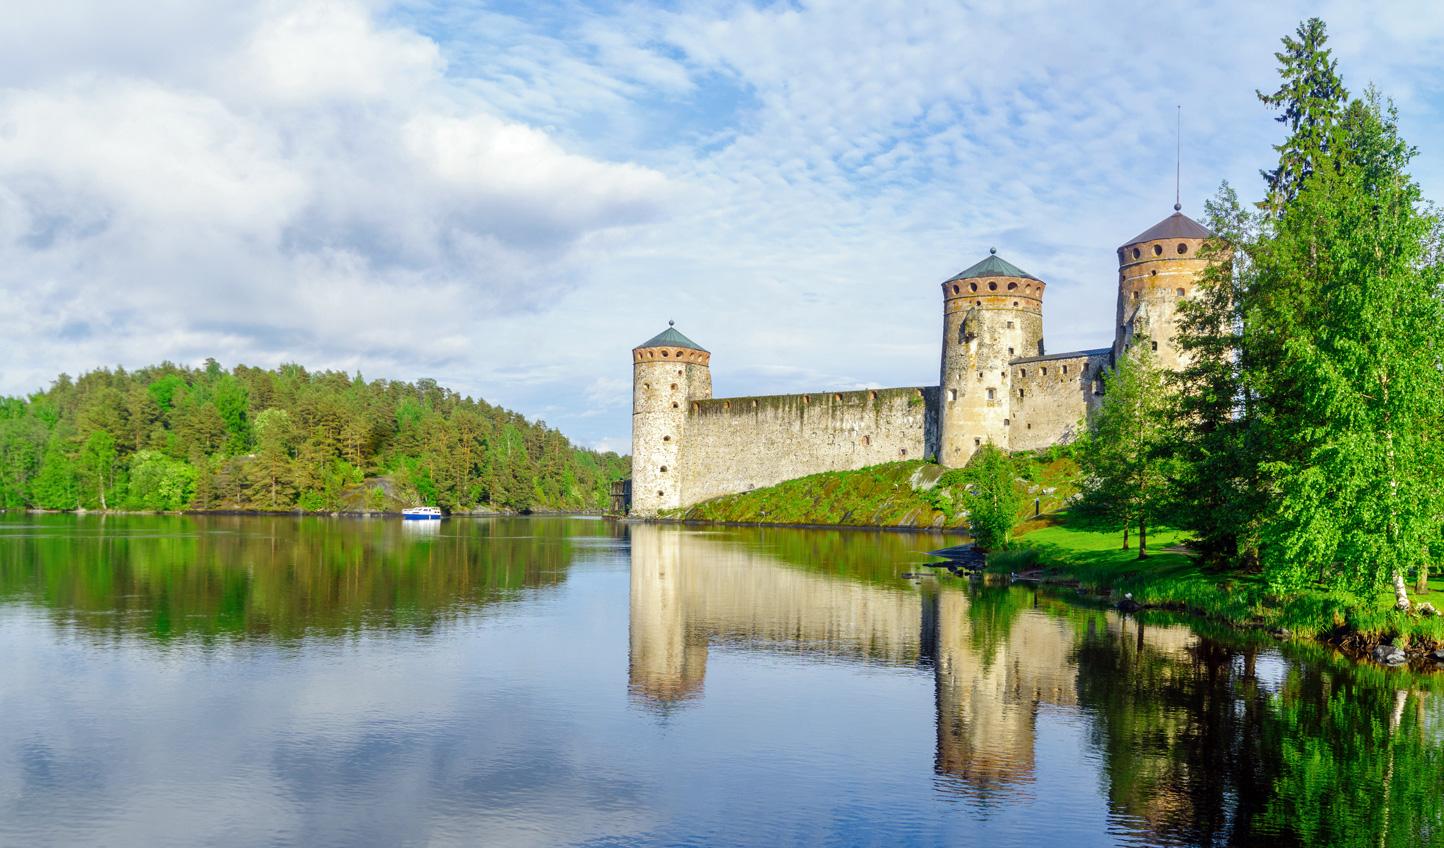 Head to Savonlinna Opera Festival in July